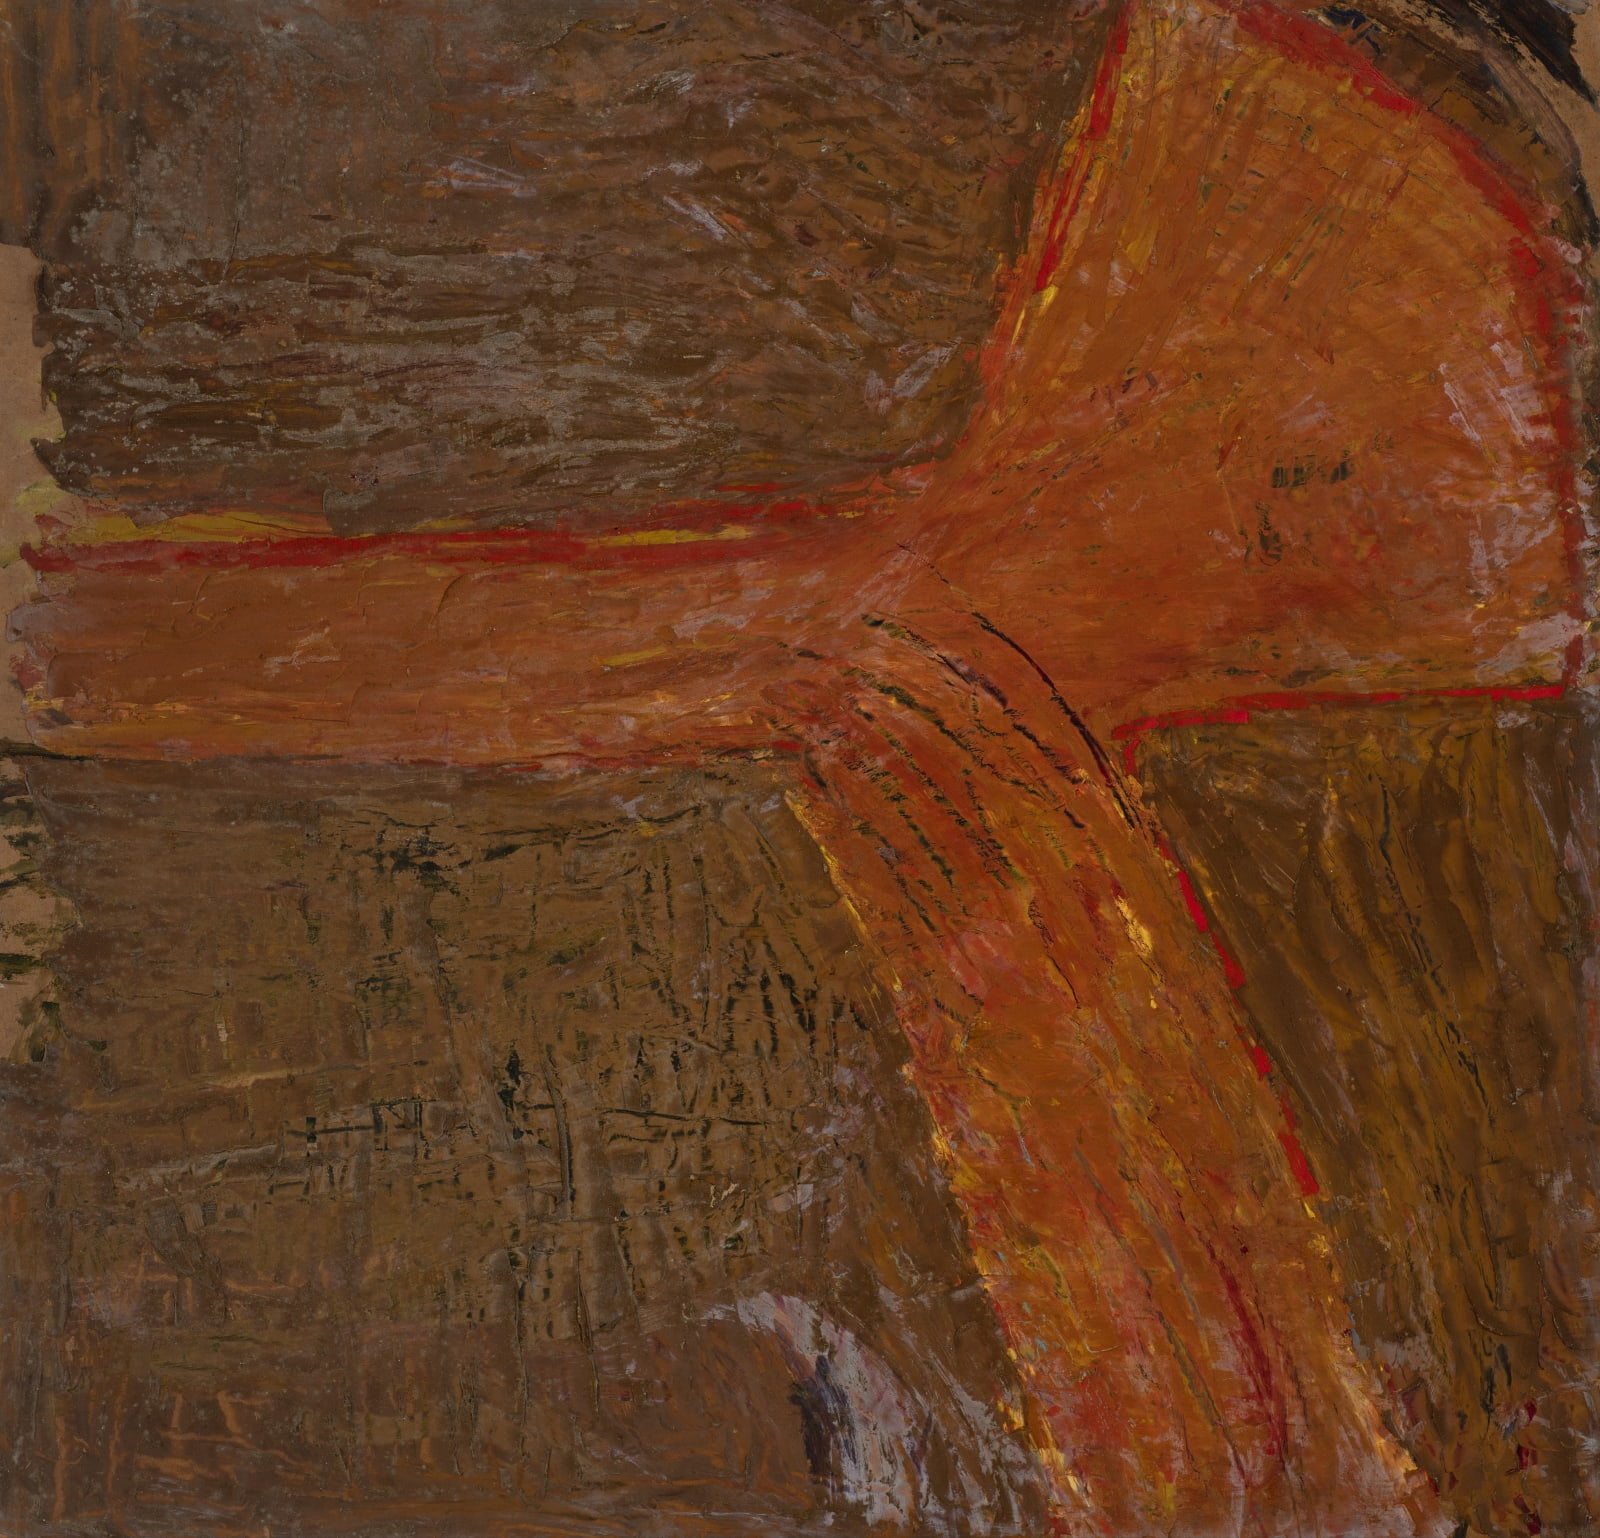 Untitled, c. 1947-53 Oil on board 122 x 117cm The Gustav Metzger Foundation